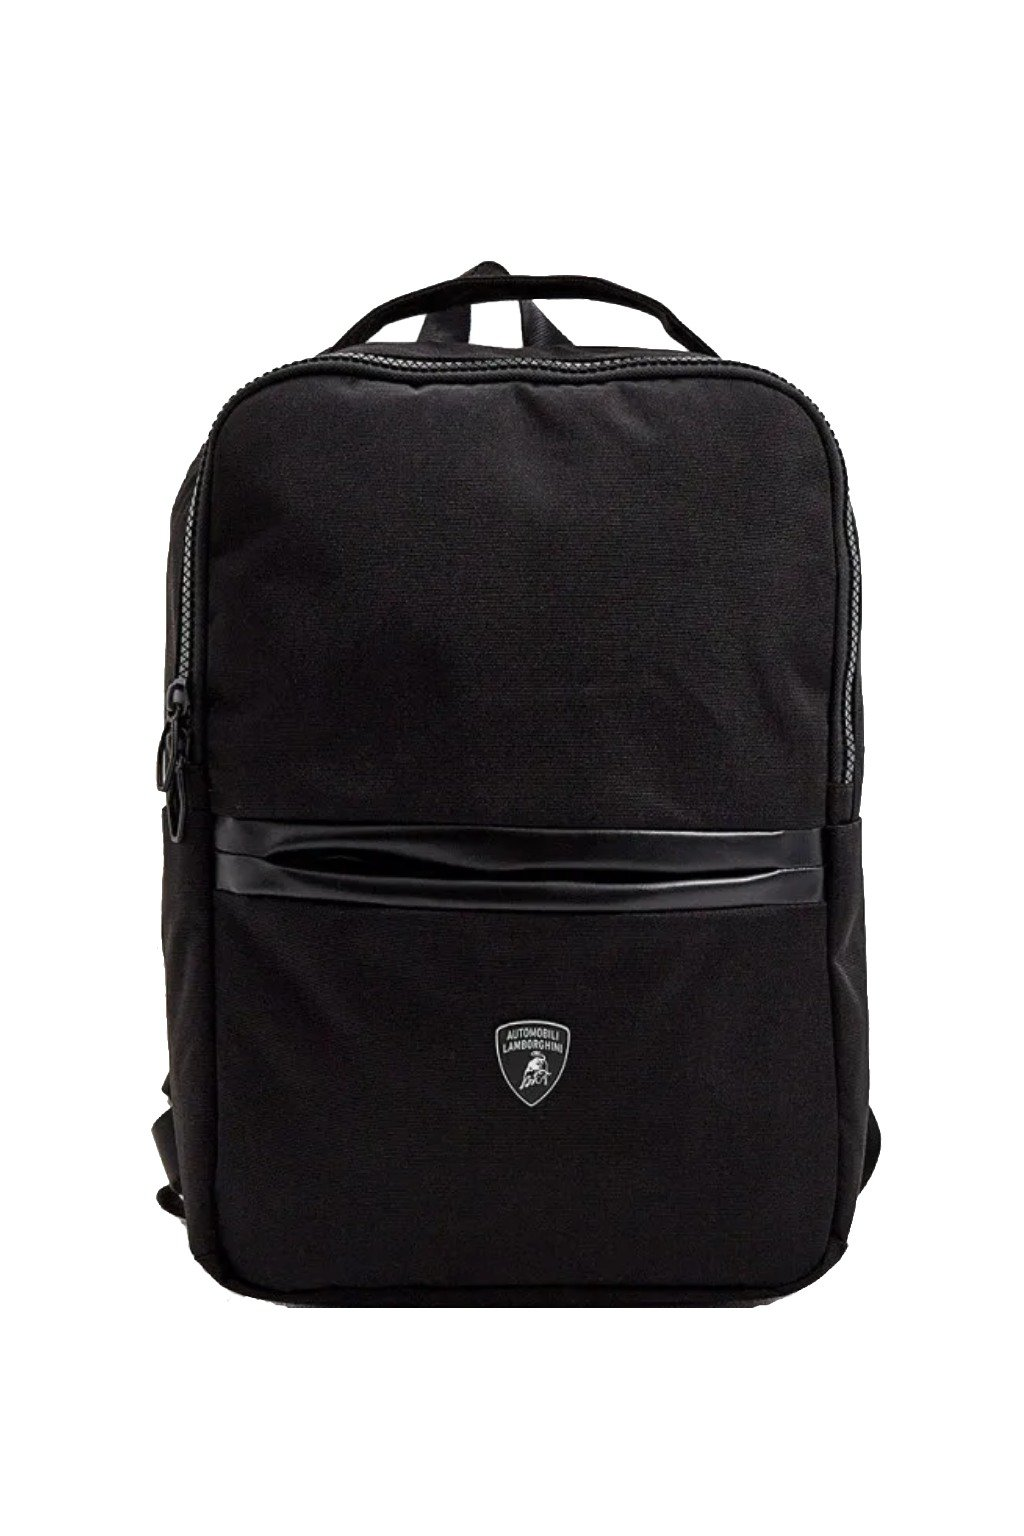 Pásnké batohy Lamborghini ruksak znackove batohy lamborghini auta superauta batohy sportovni batohy batohy pro muze doplnky lamborghini praha panska moda cerny batoh cerny pansky batoh tmave modry zlute lamborghini (1 (4)